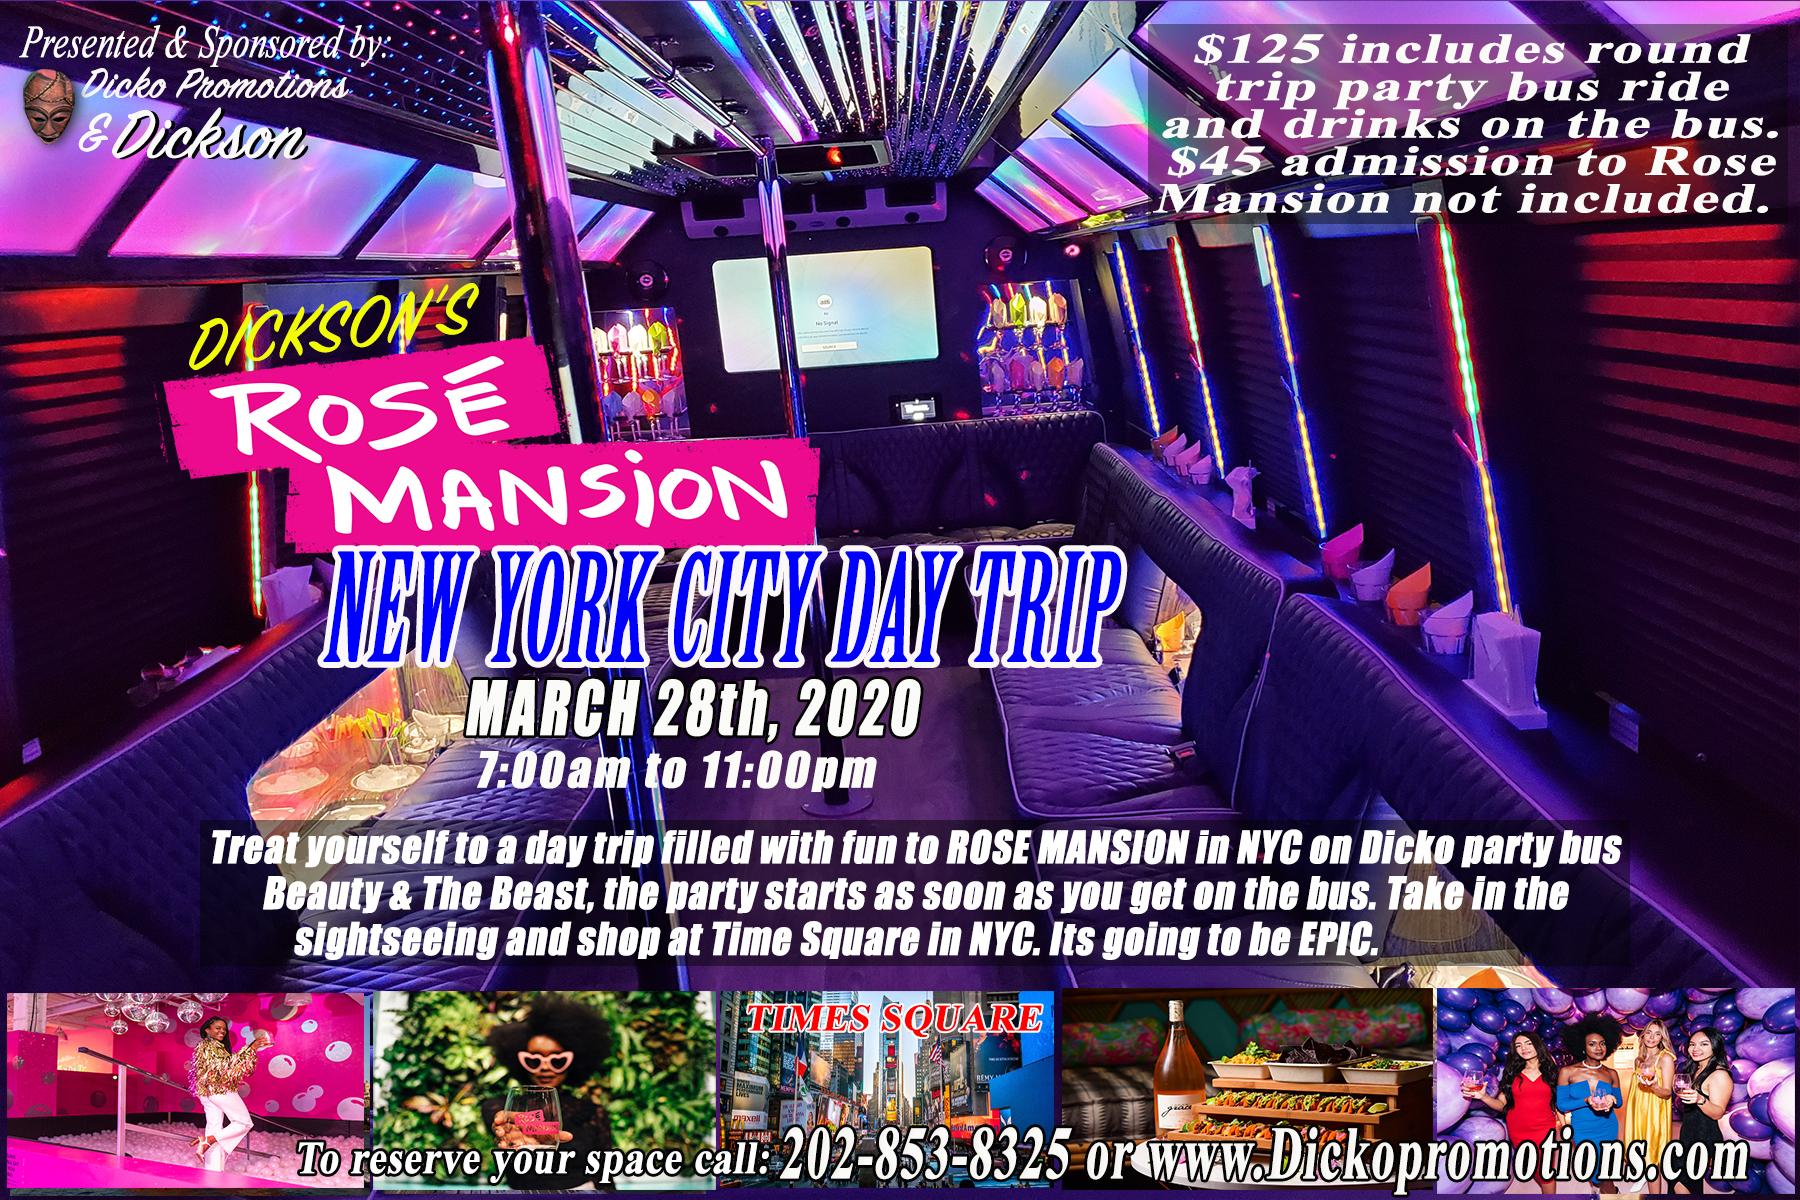 Rose Manson March 28th NYC getaway